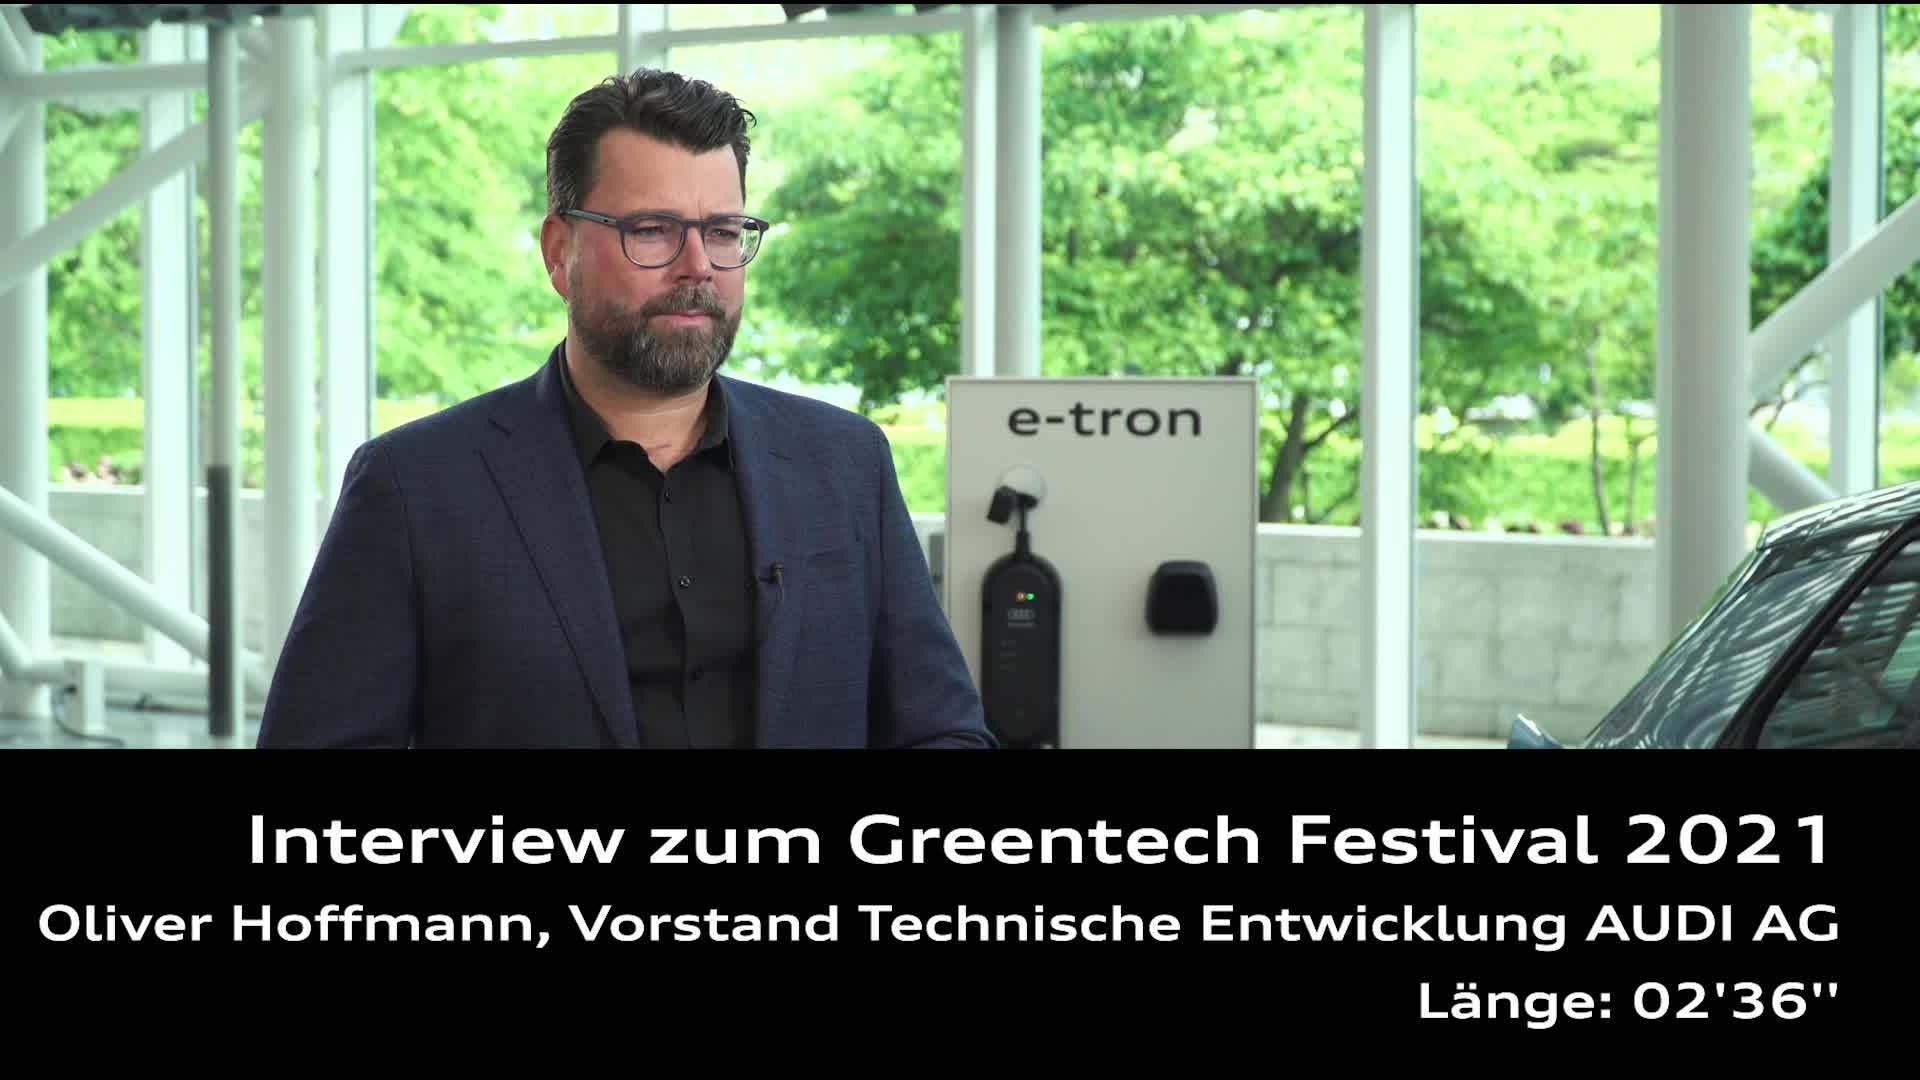 Interview zum Greentech Festival 2021 mit Oliver Hoffmann